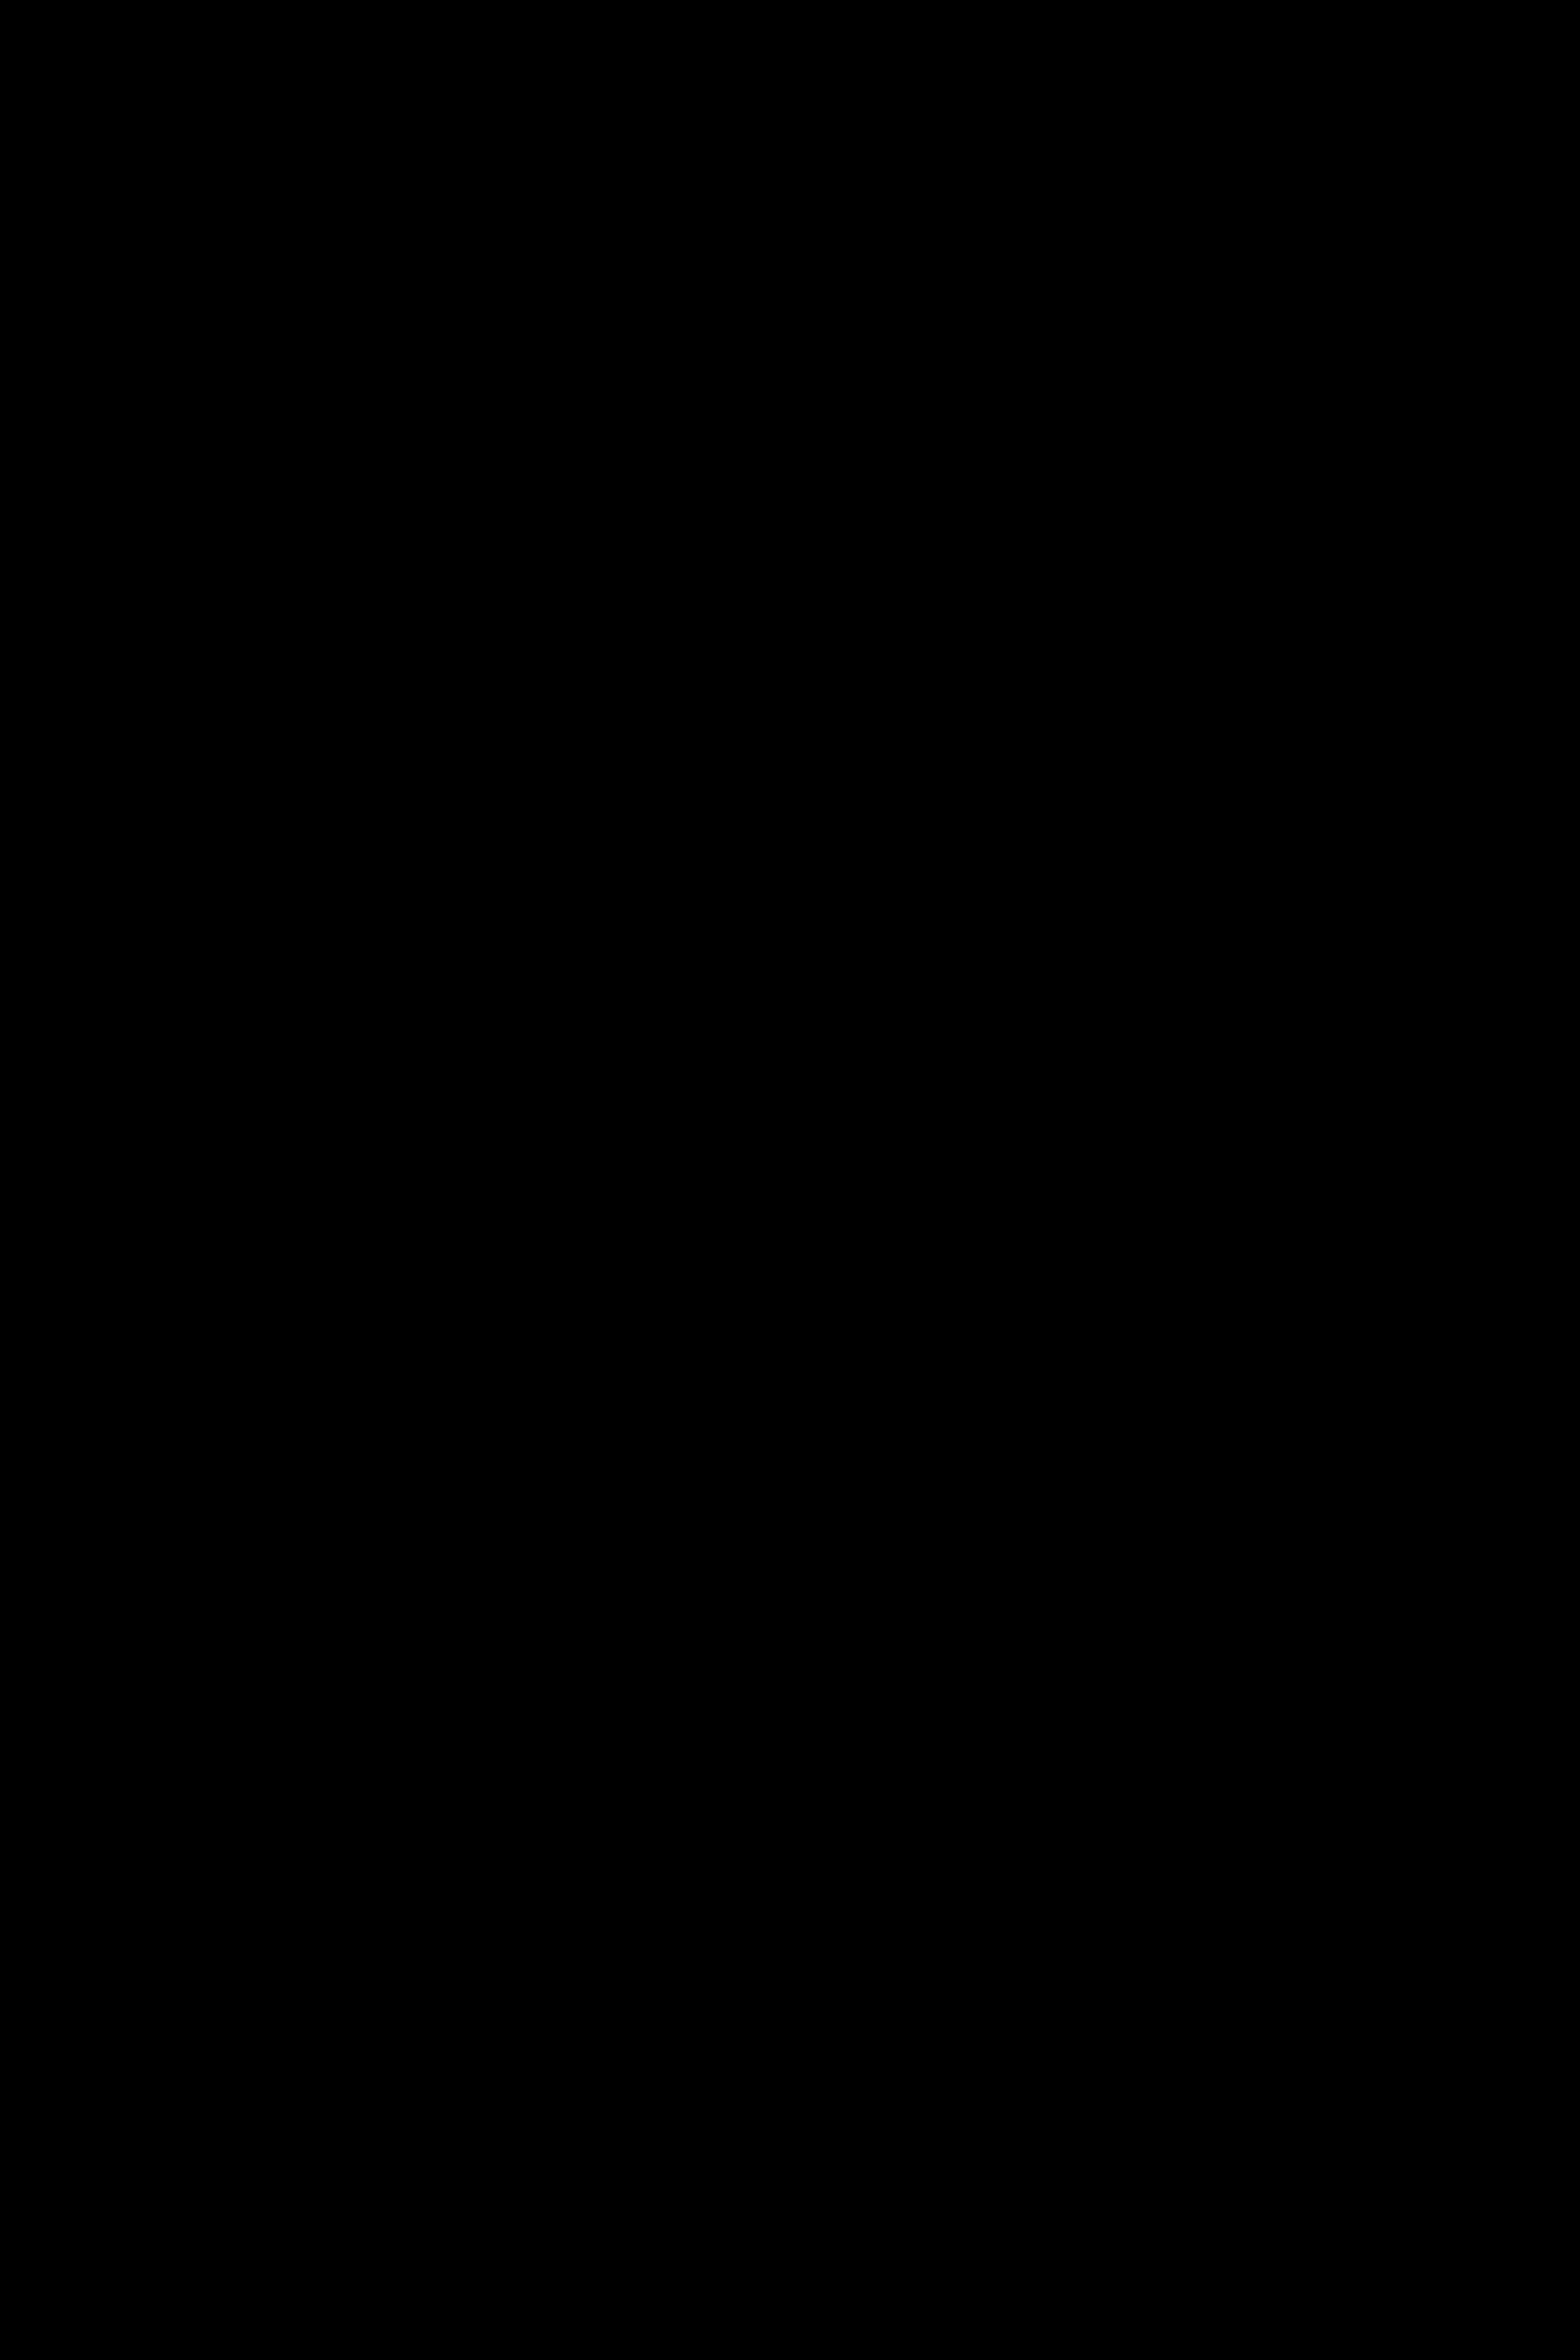 png transparent download Clipart